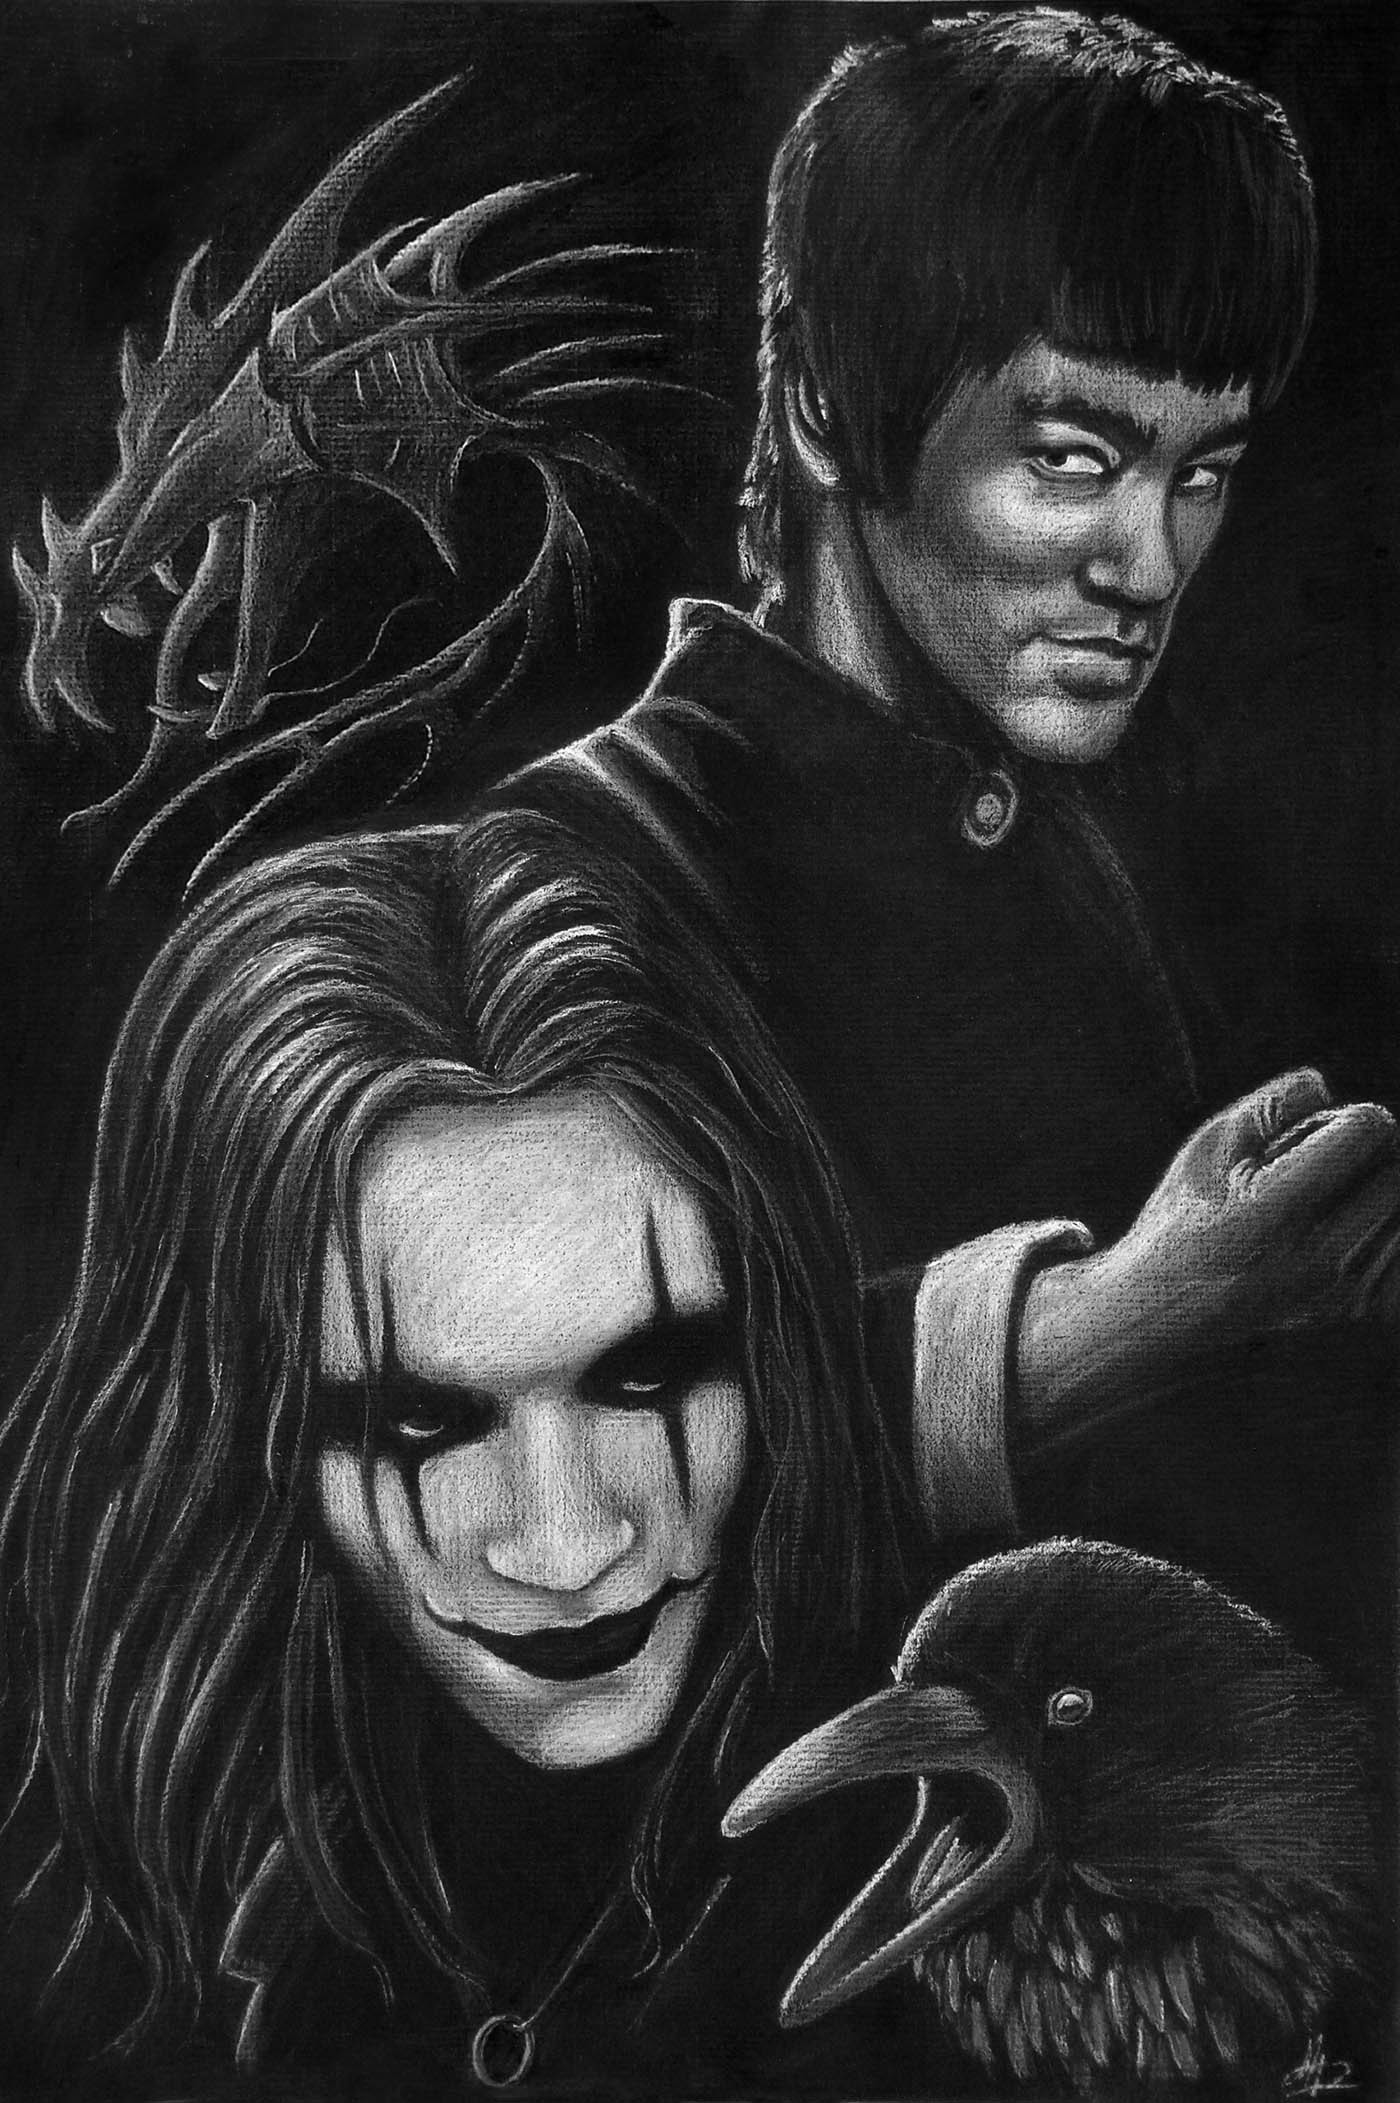 Bruce Lee Wallpaper Desktop Posted By Michelle Johnson